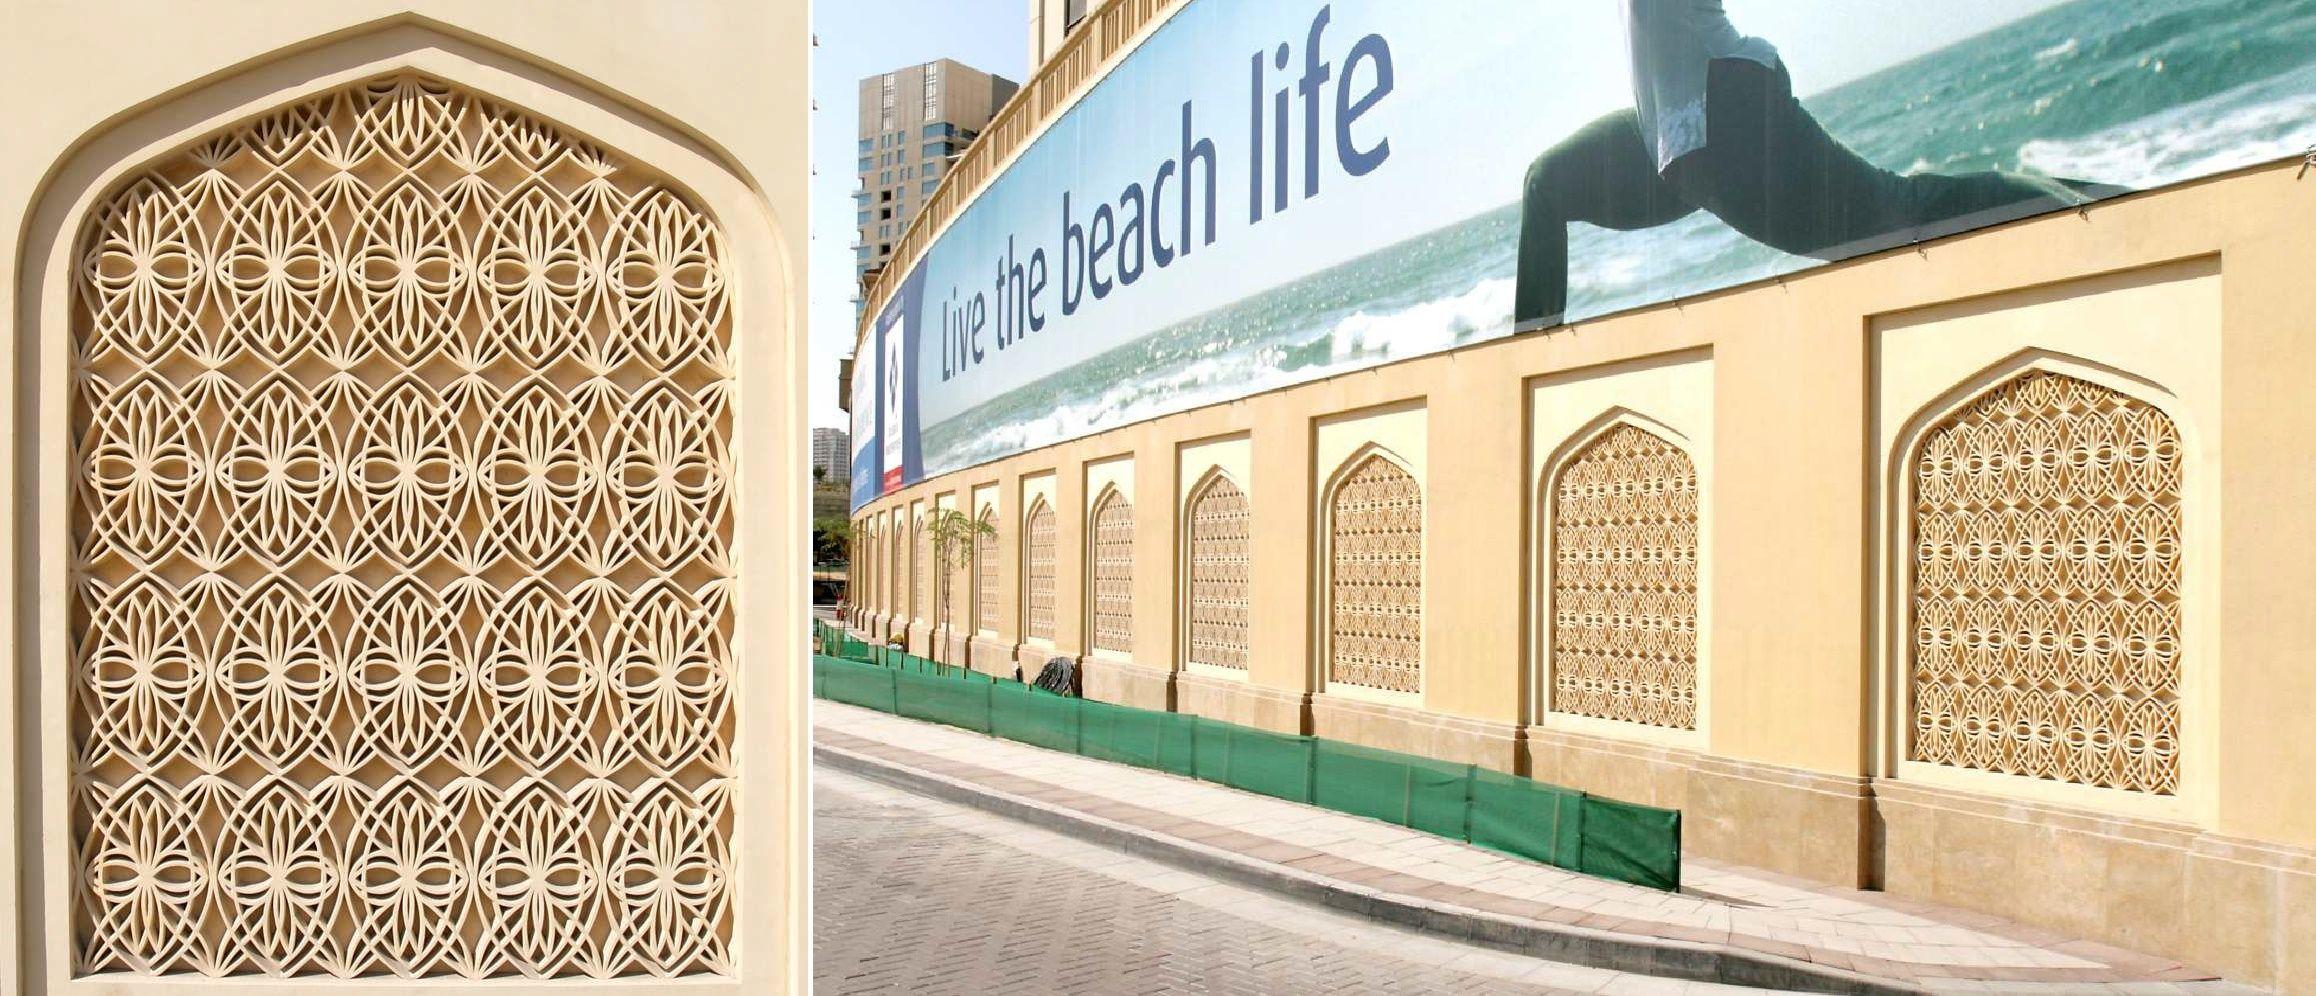 GFRC Walls | Formliners for Architectural Concrete | Pinterest ...